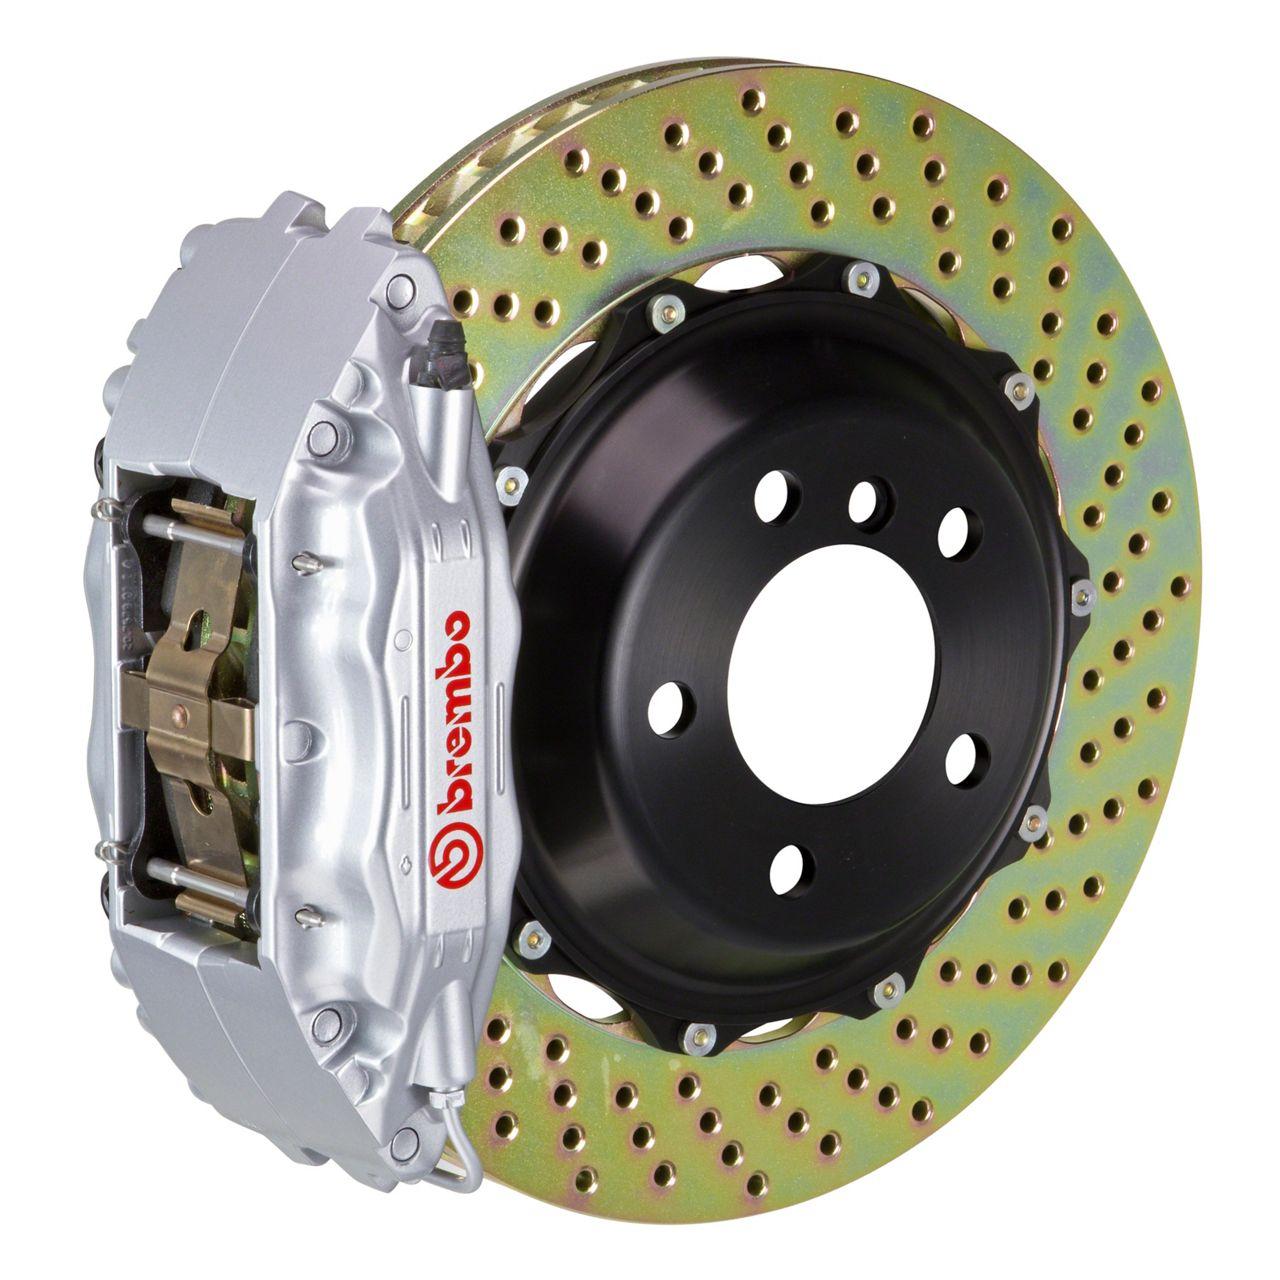 Brembo GT Series 4-Piston Front Big Brake Kit - 14 in. 2-Piece Cross-Drilled Rotors - Silver (09-10 R/T, SE)